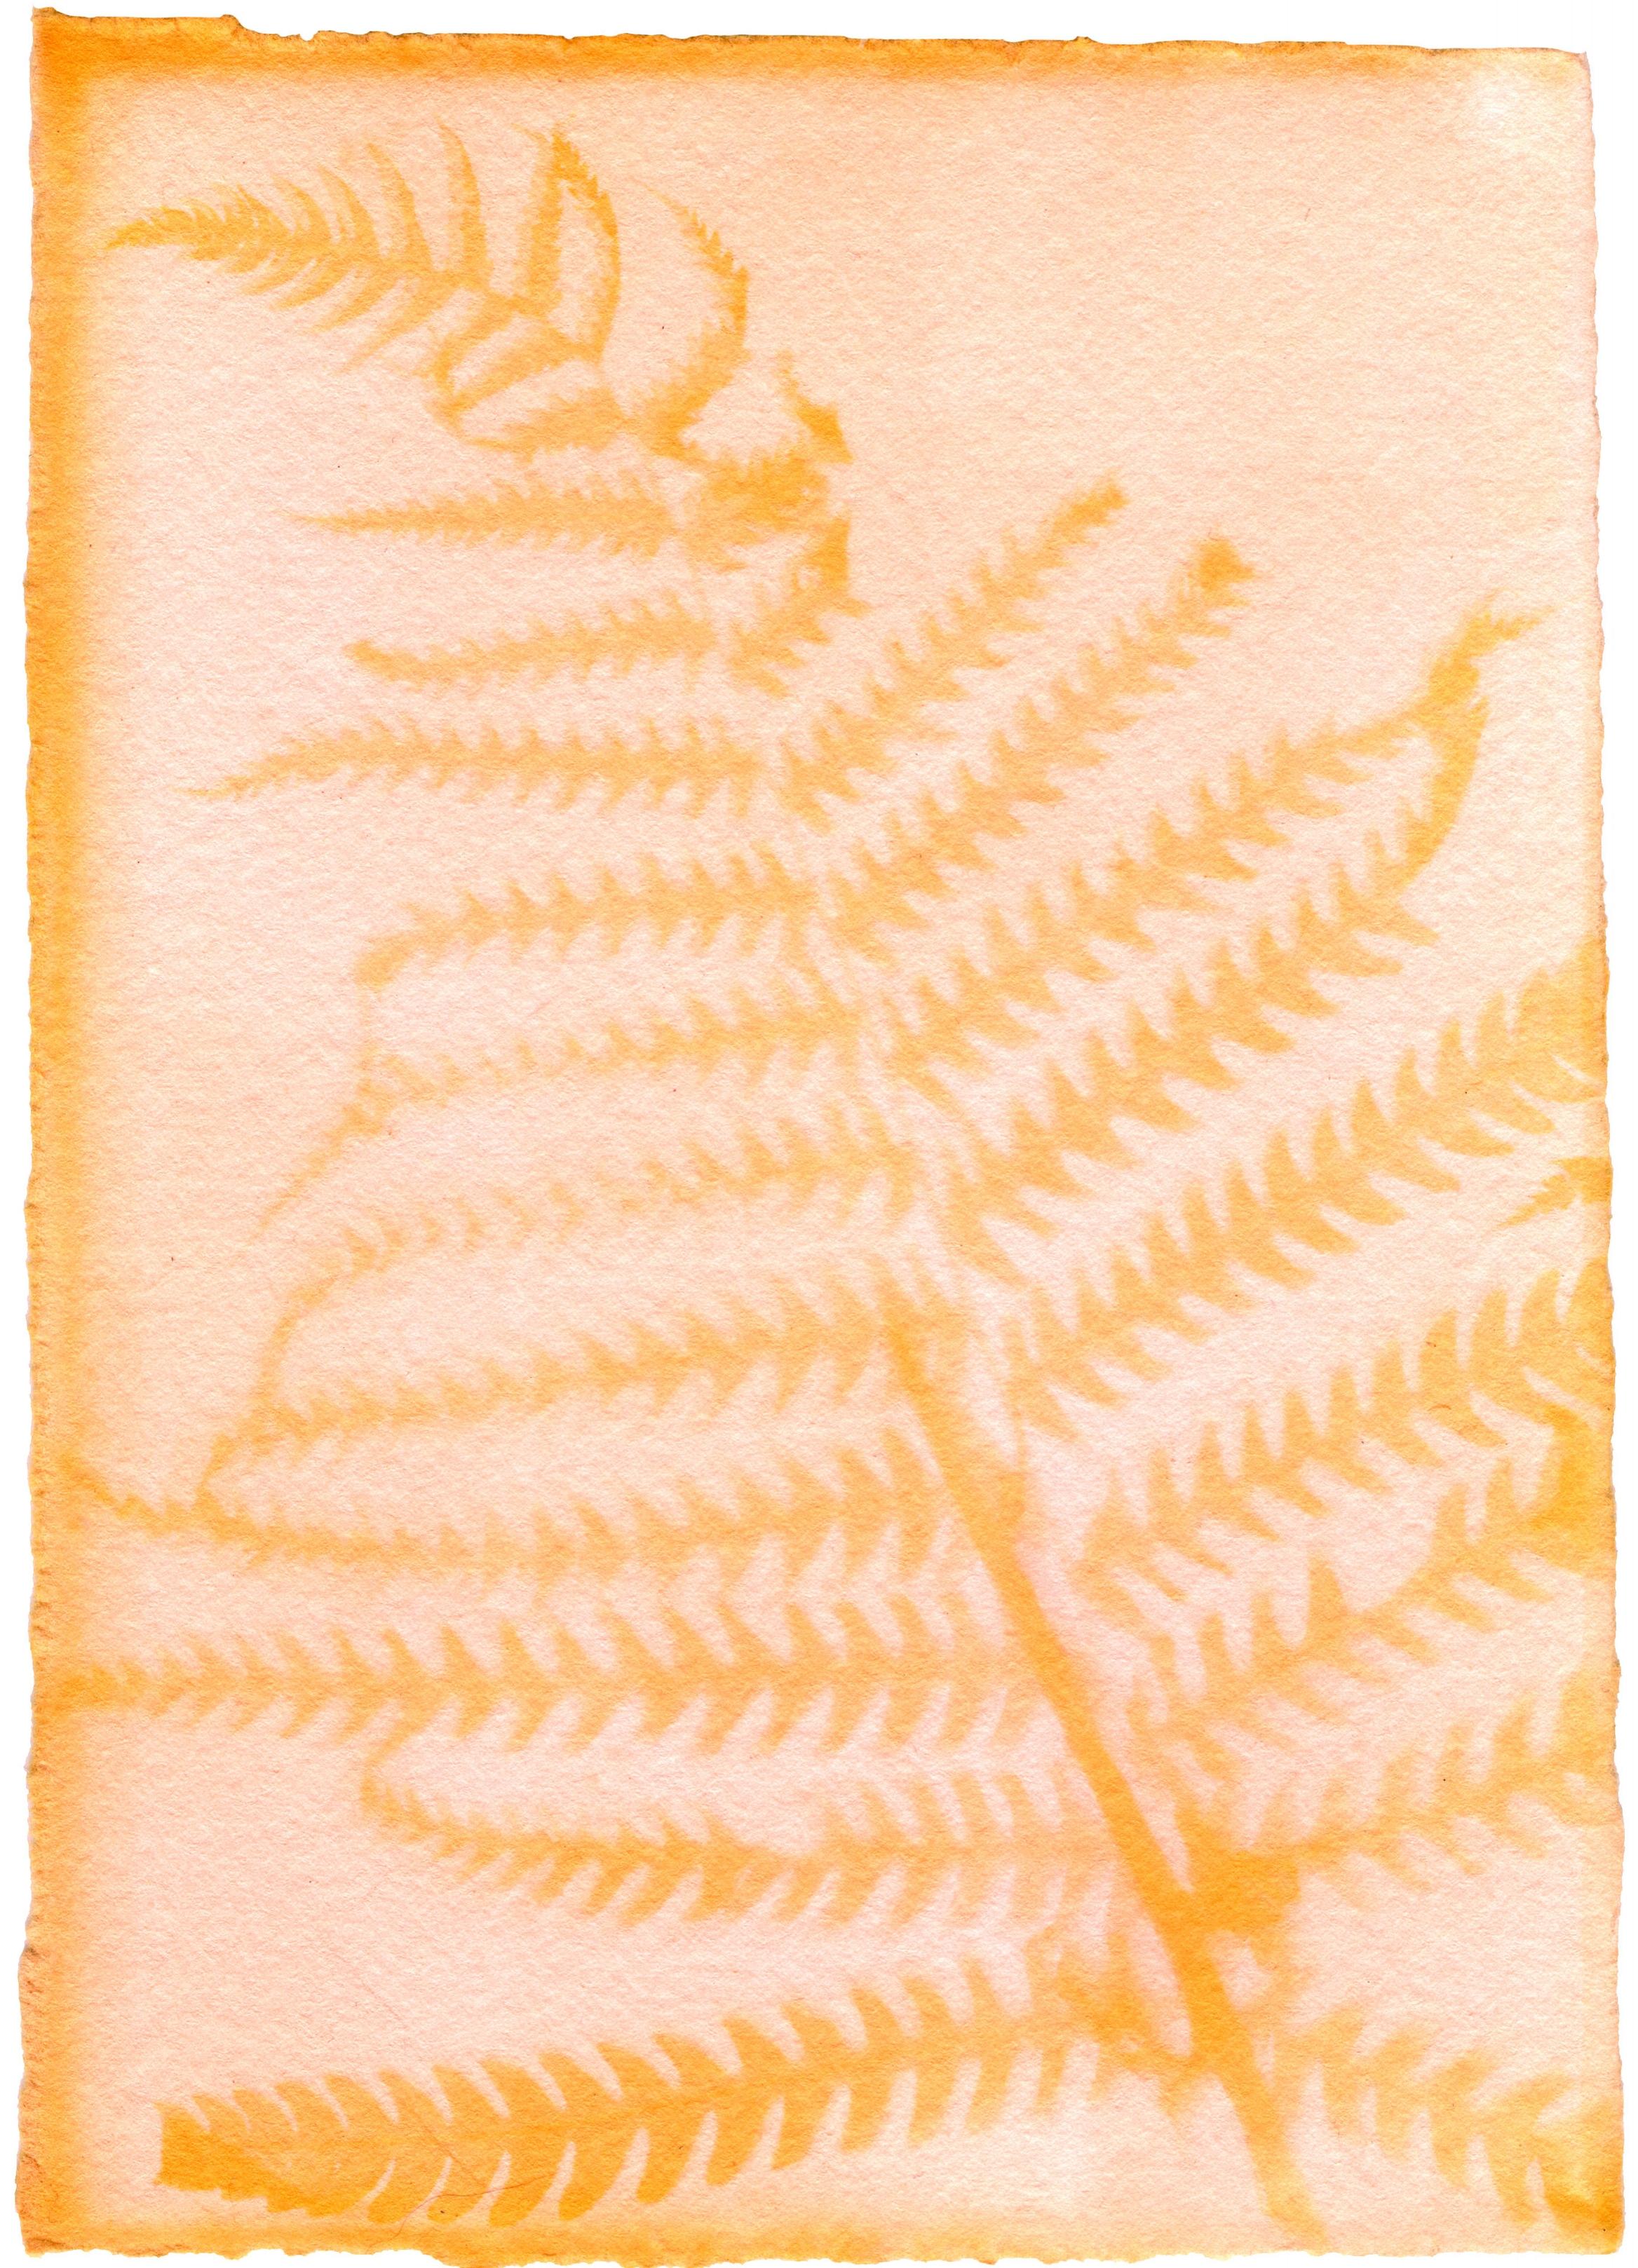 "Matteuccia Struthiopteris with Achiote Emulsion with Matteuccia Struthiopteris Skim Coat, 7"" x 5"", 2018"